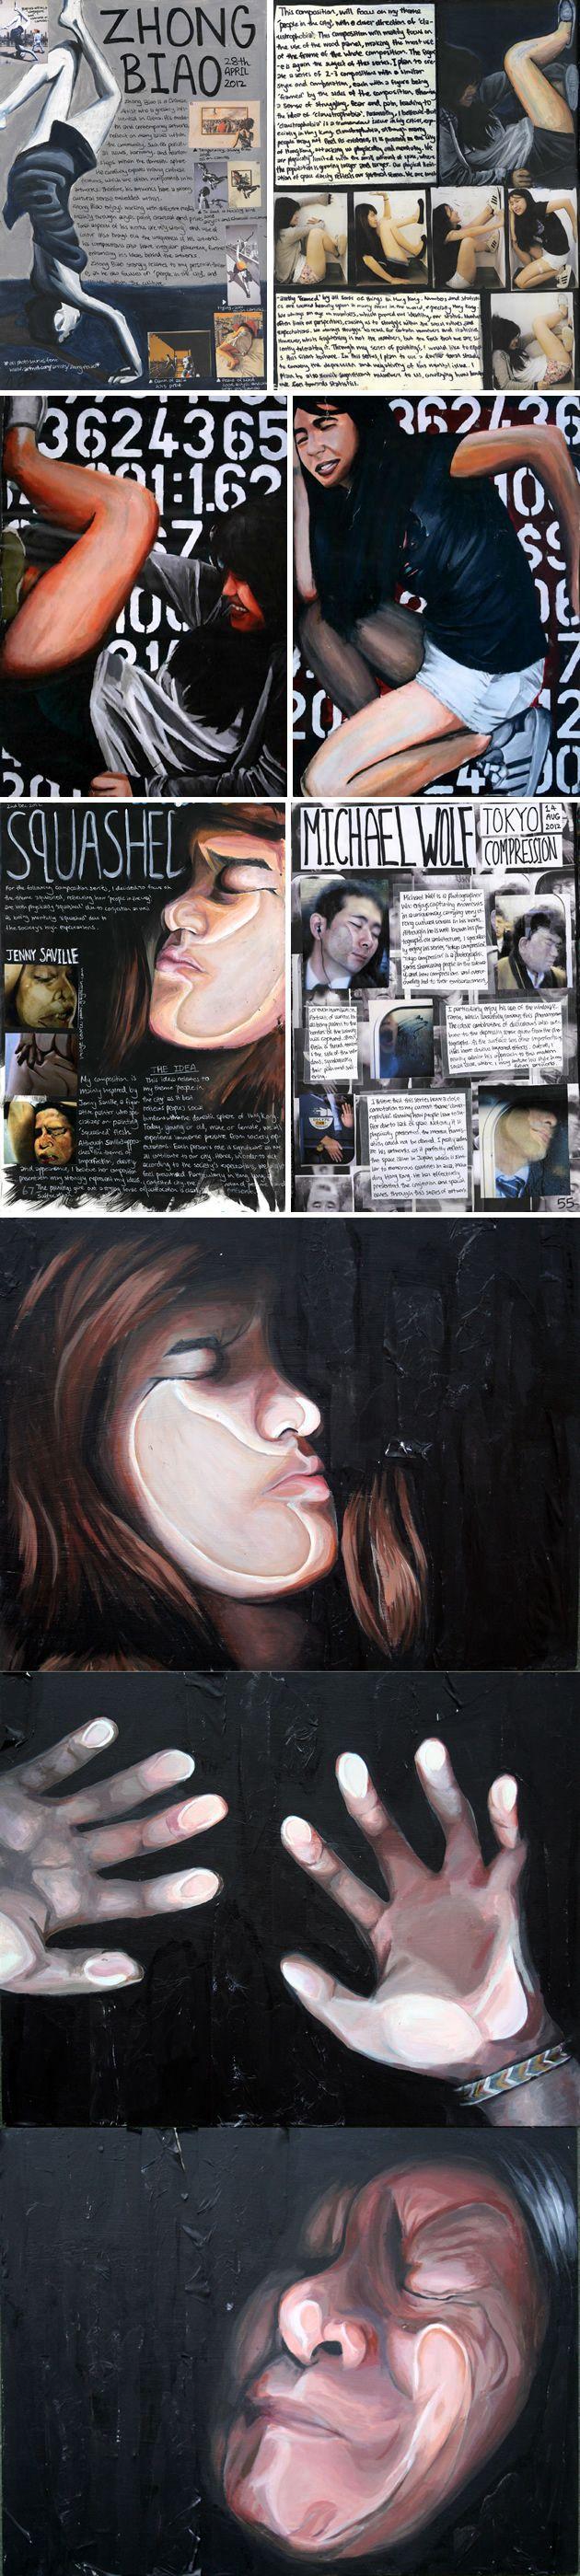 Visual art project